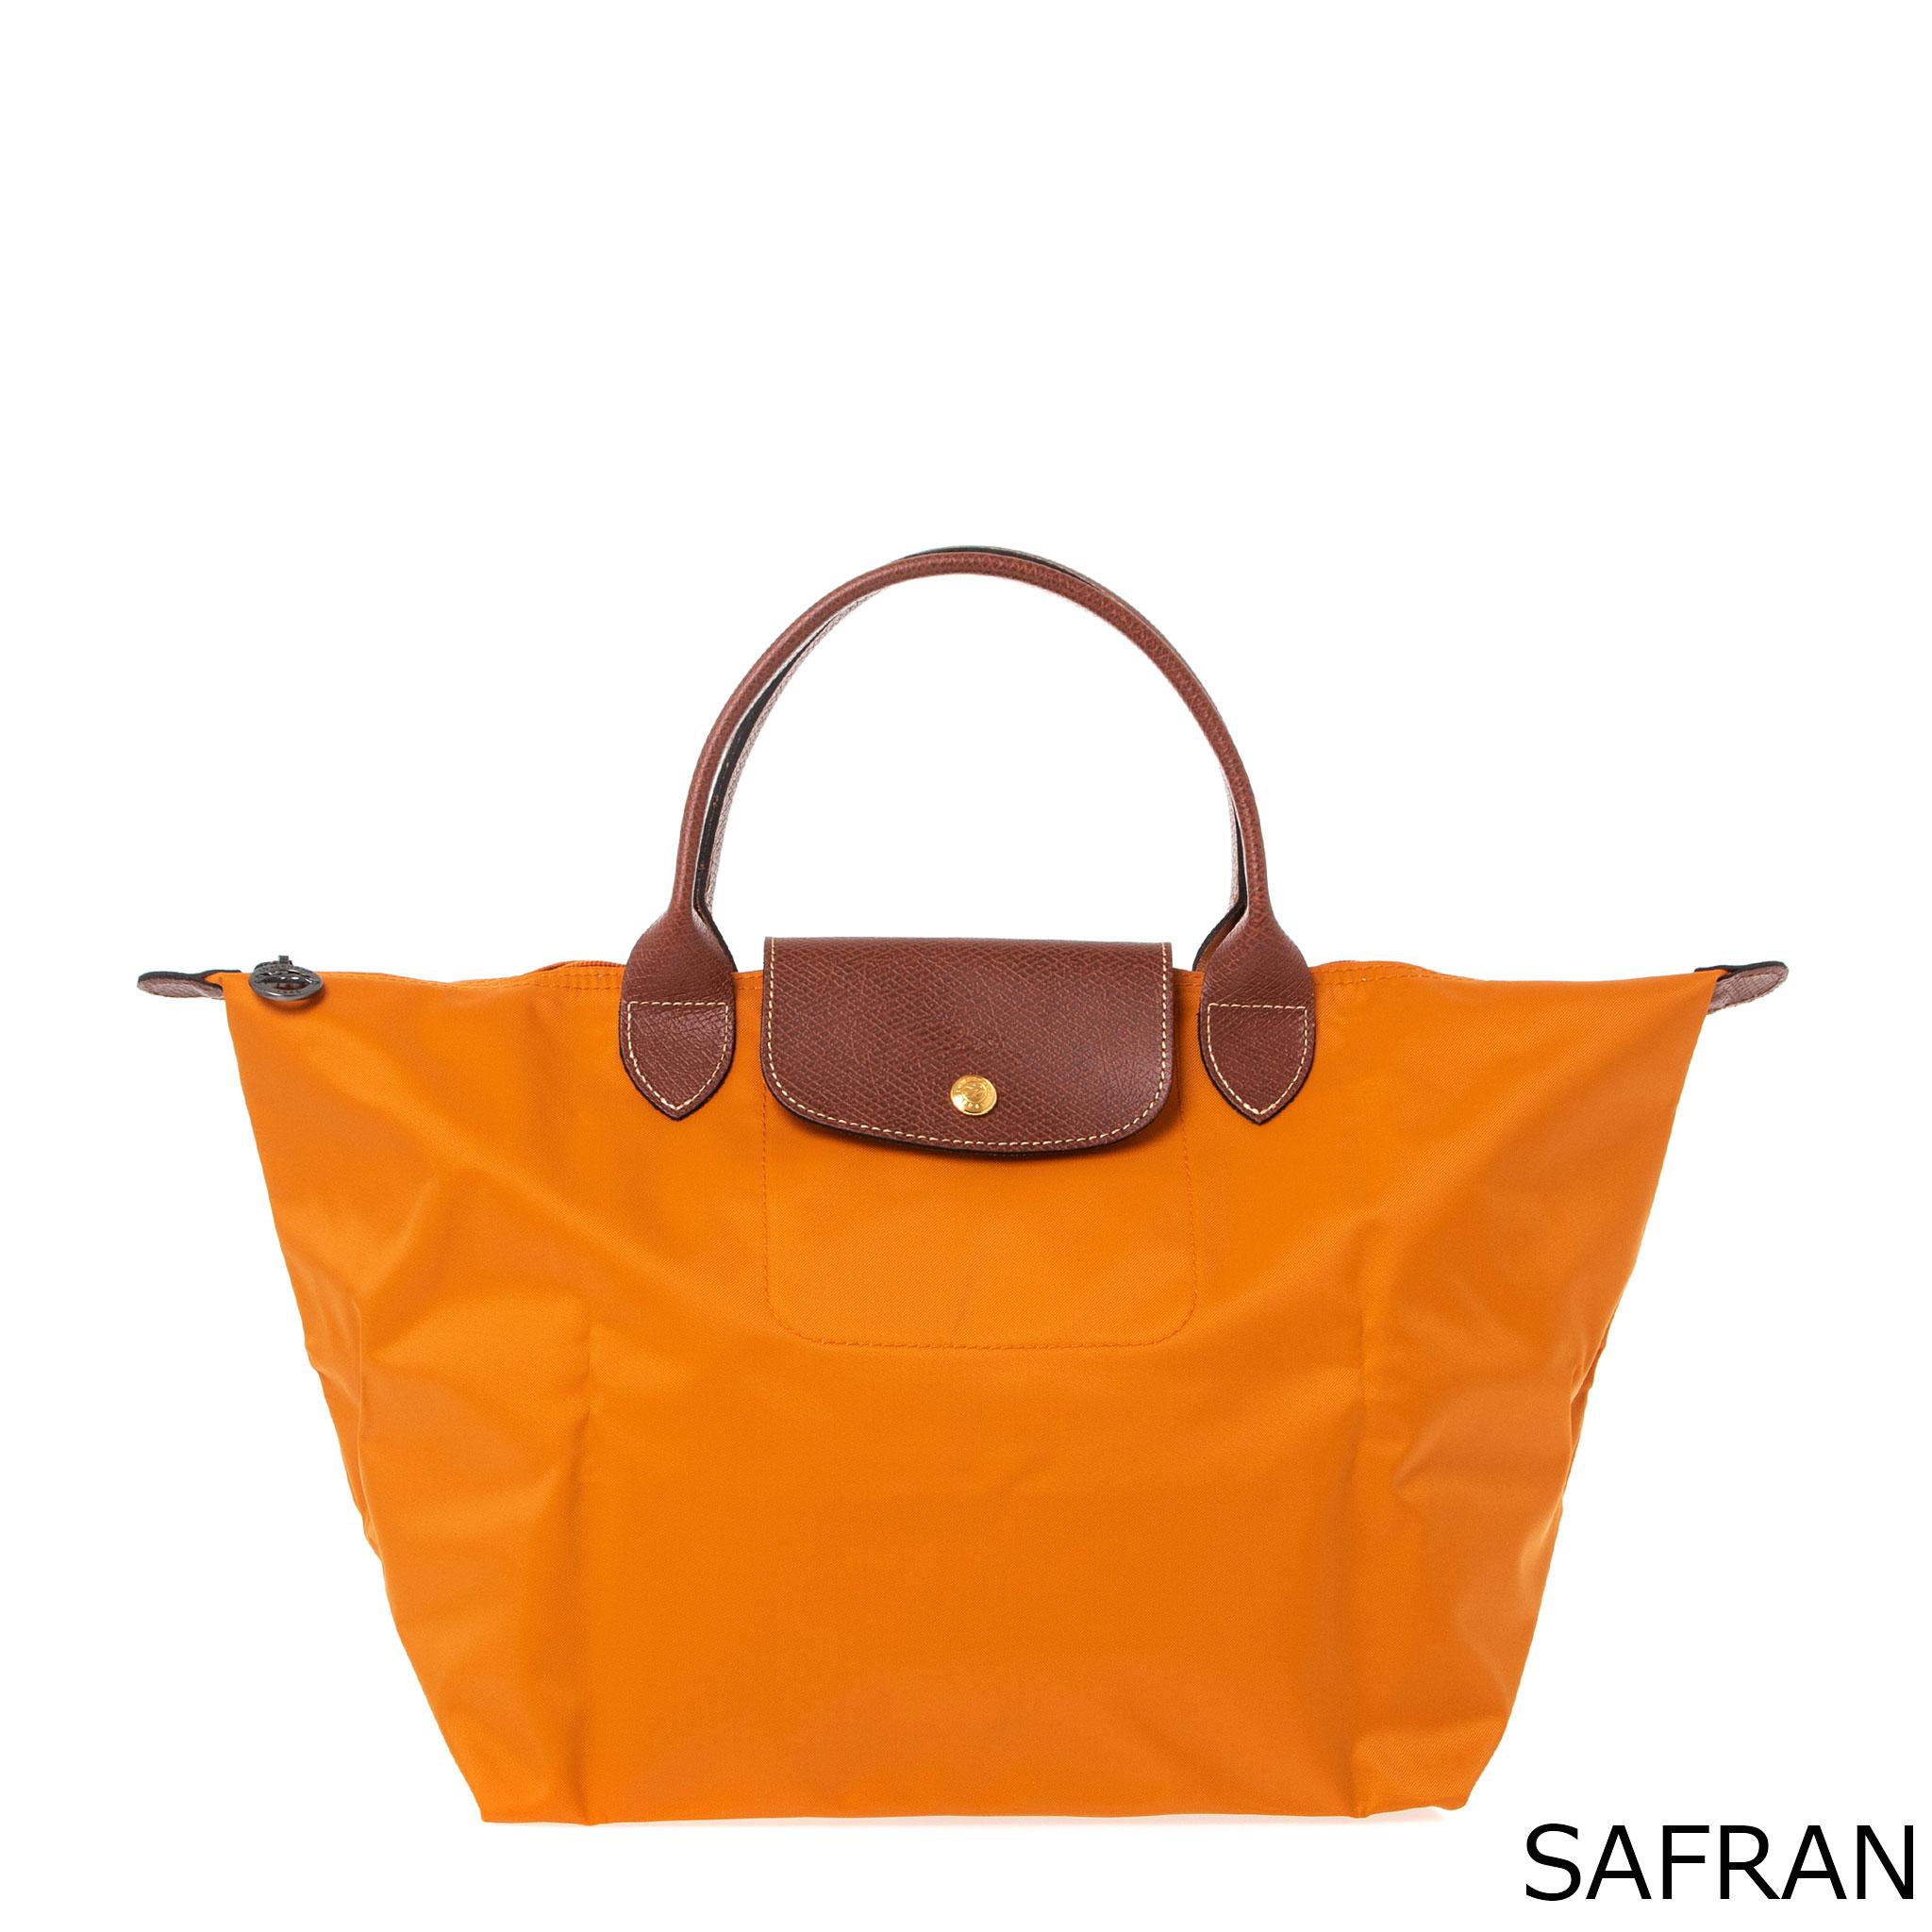 63061b4264 ChelseaGardensUK: Longchamp tote bags LE PLIAGE 1623 089 LONGCHAMP ...